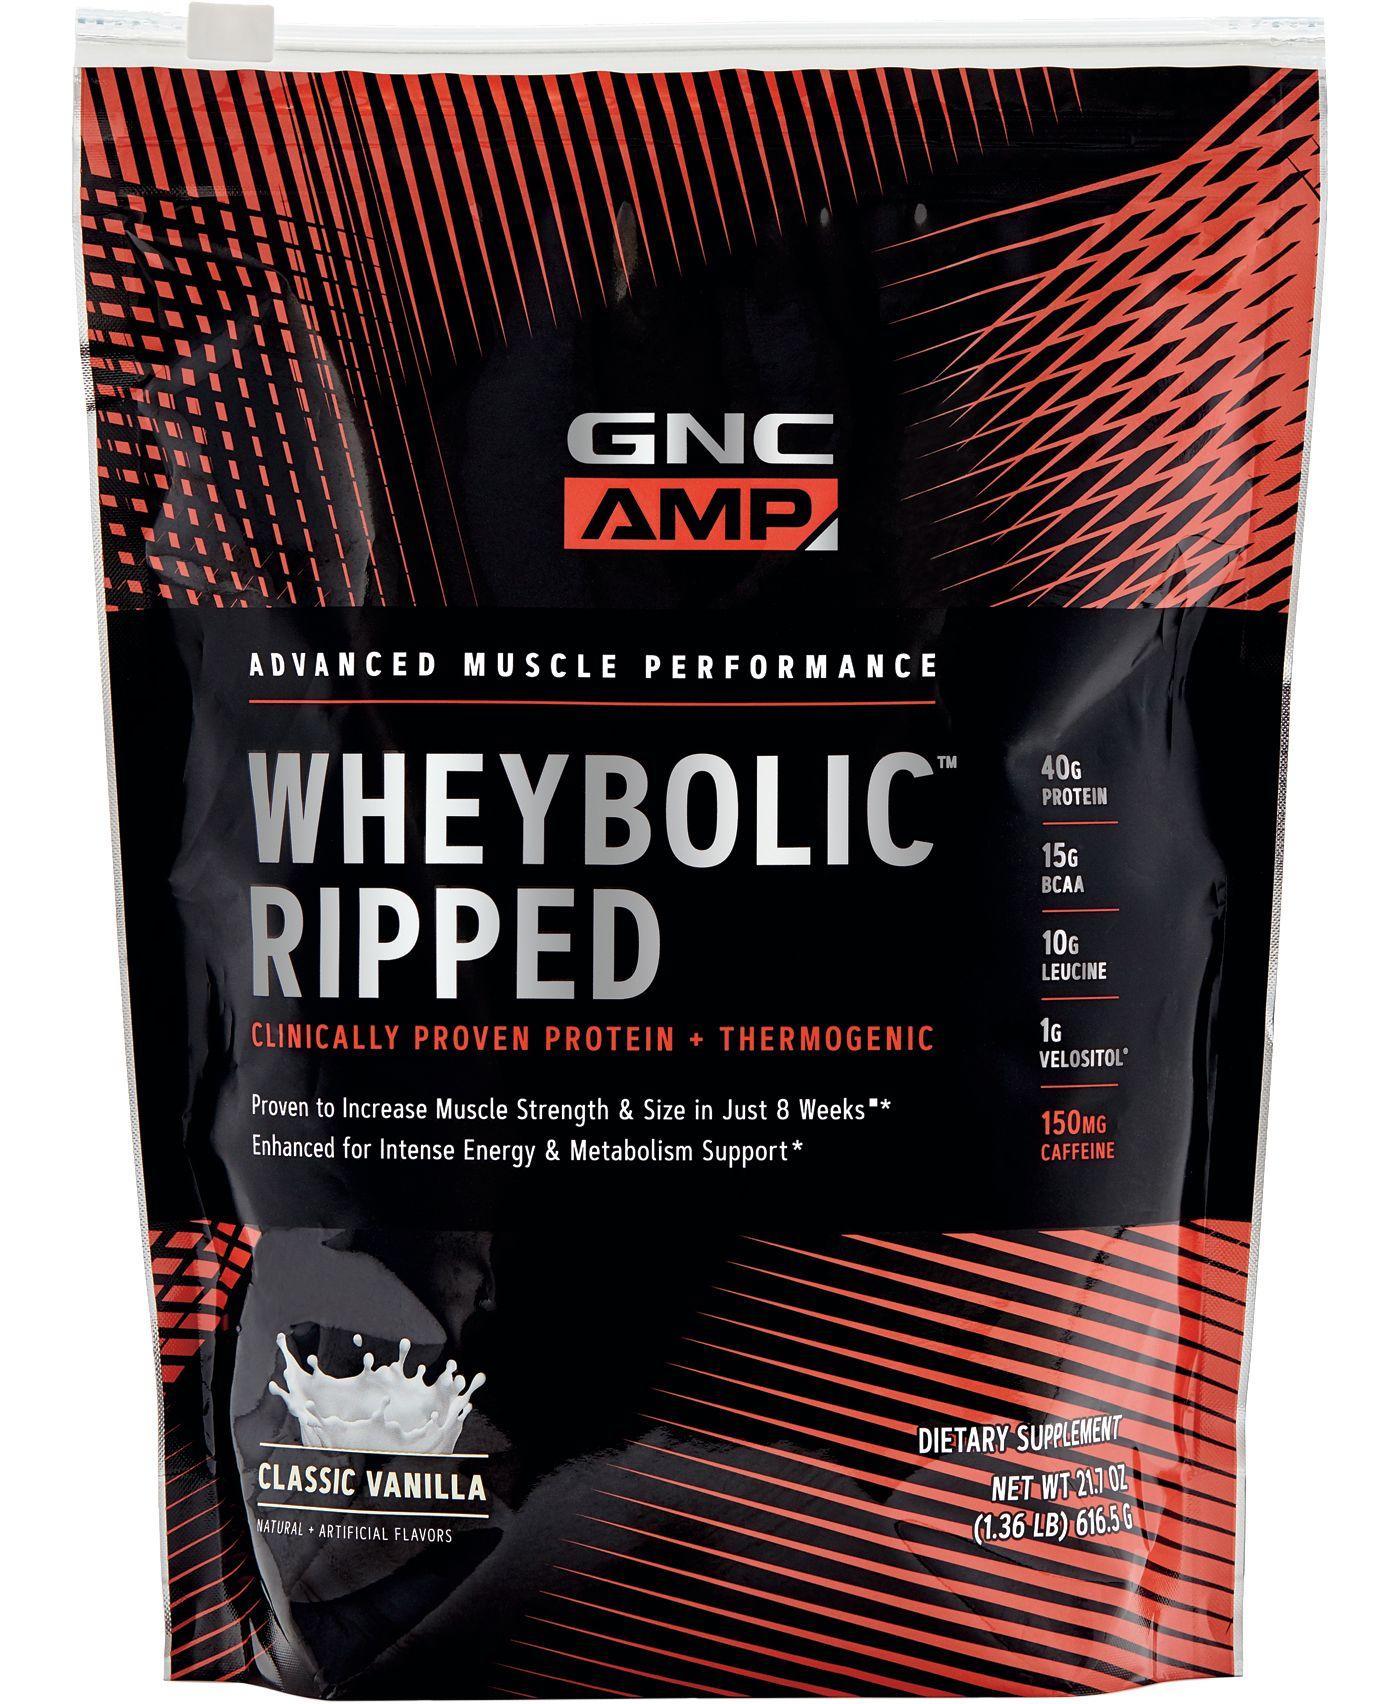 GNC AMP Wheybolic Ripped Protein Classic Vanilla 9 Servings